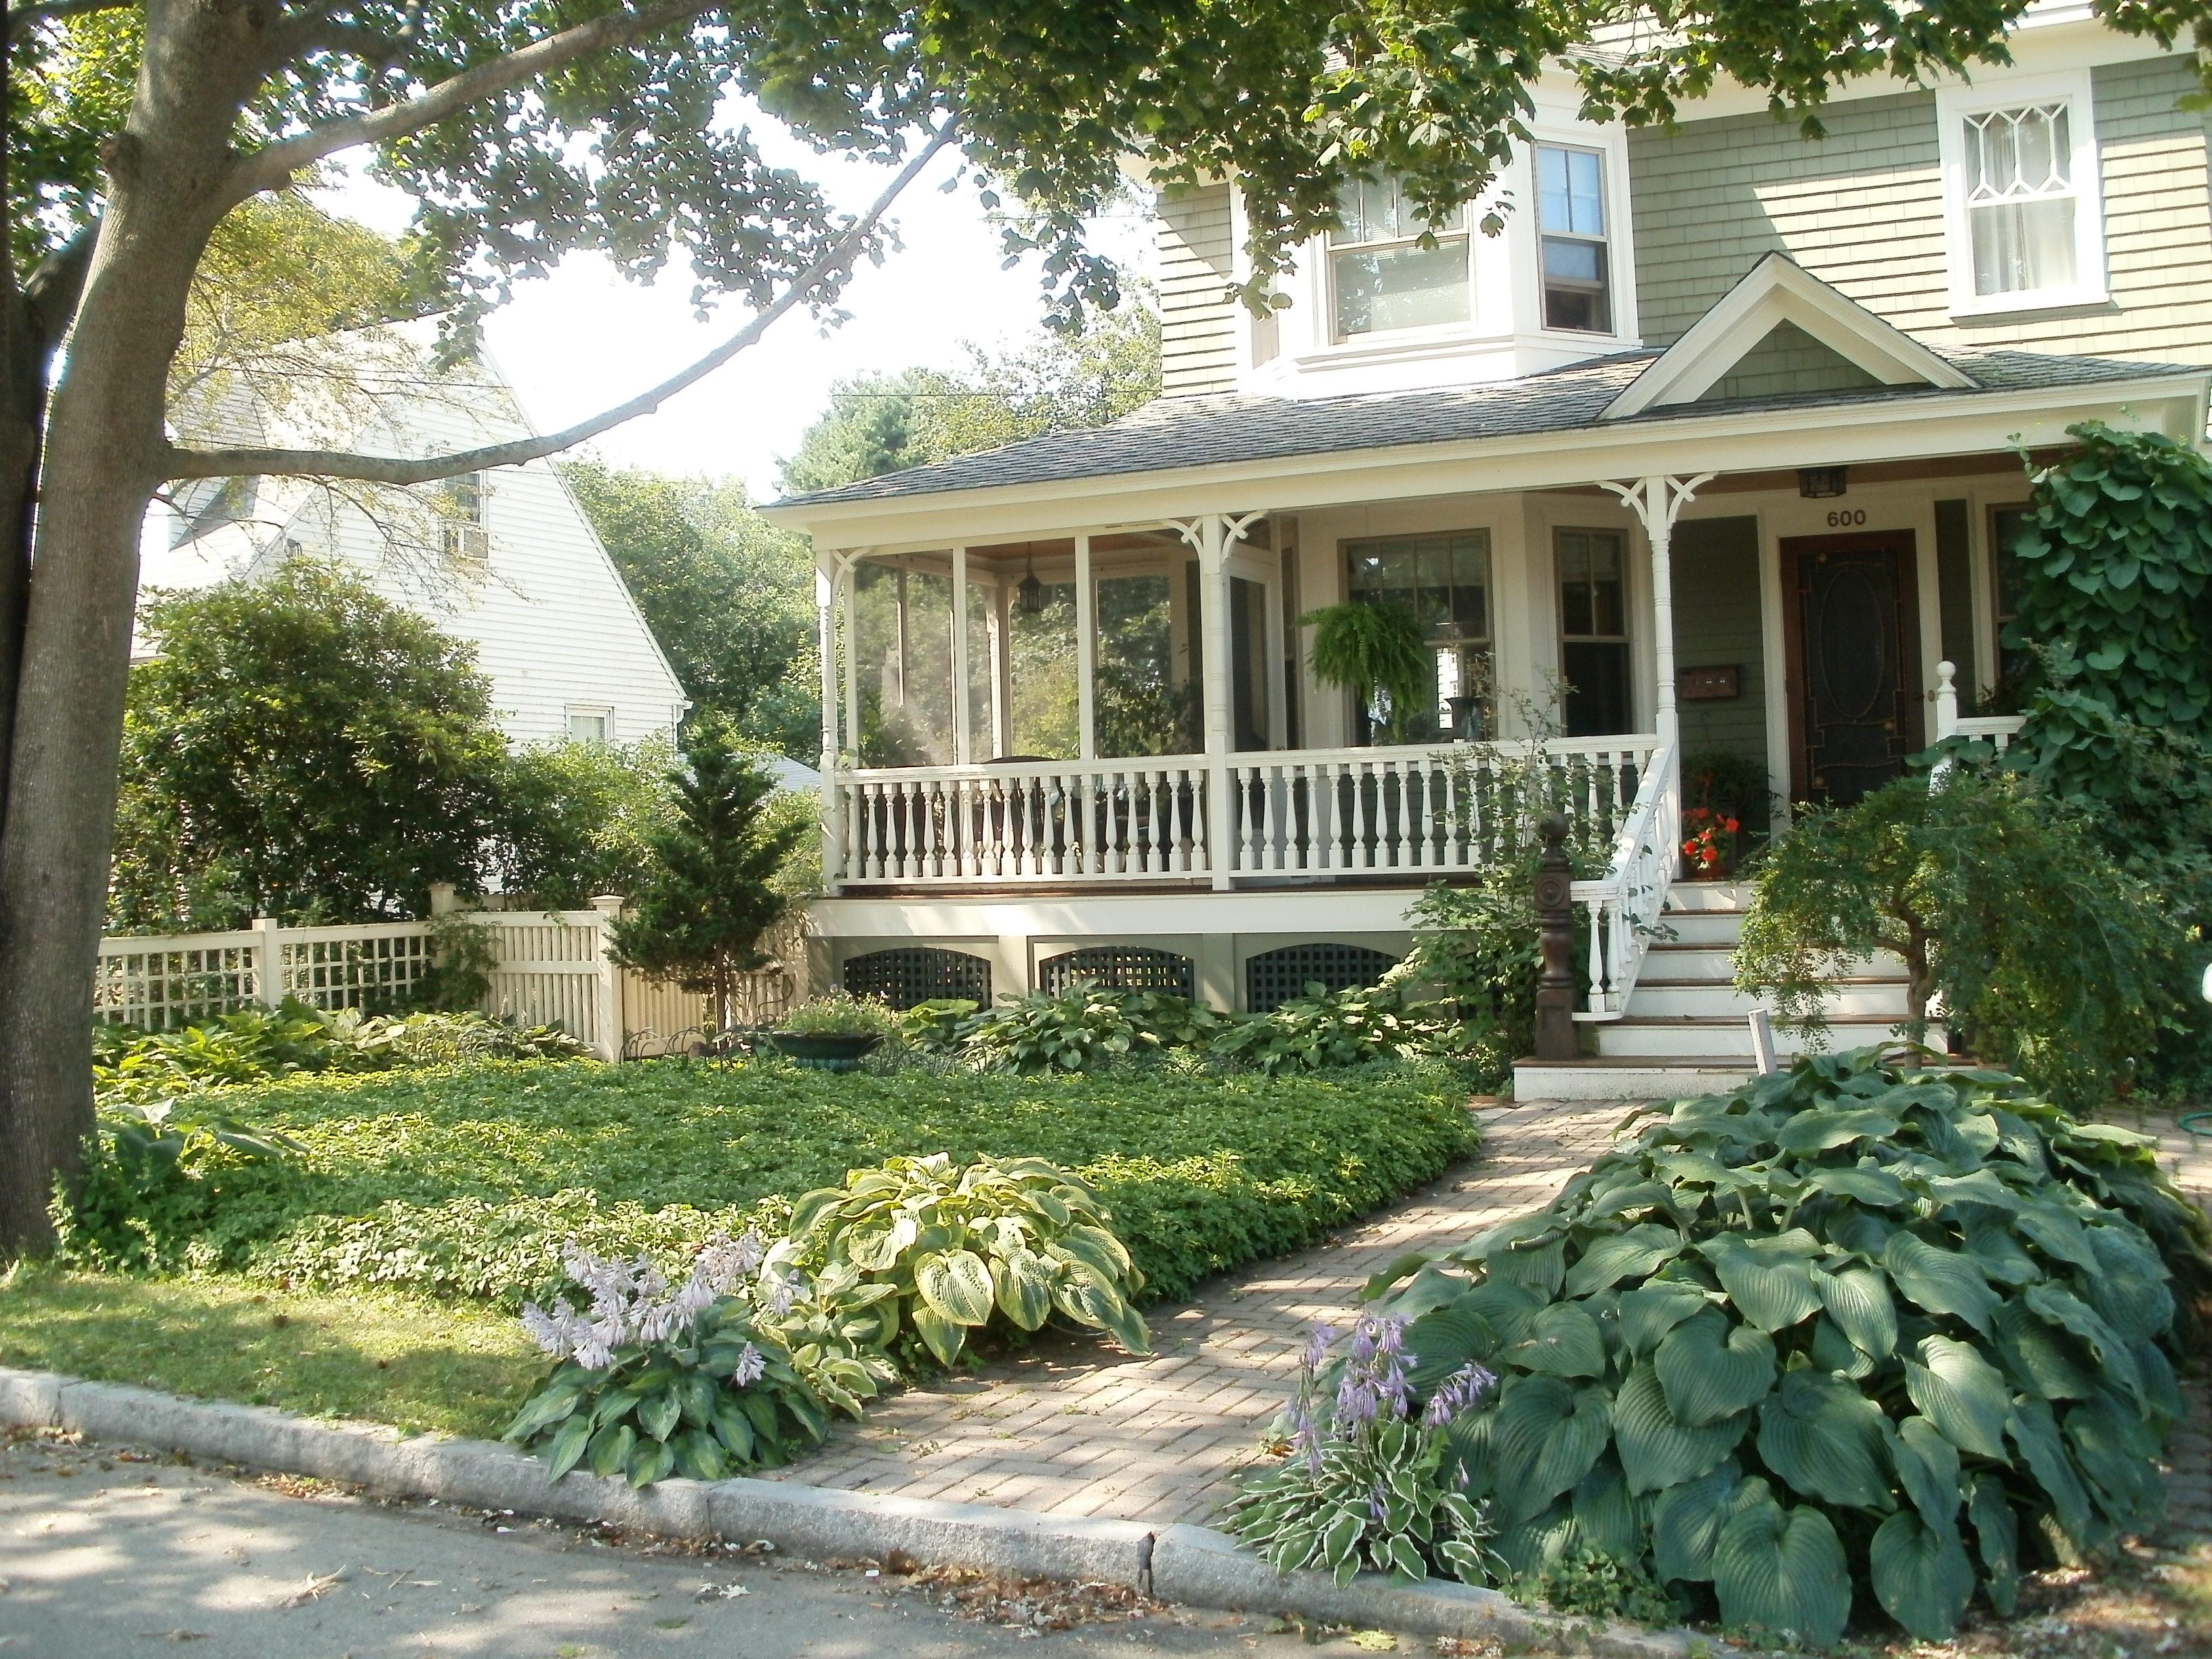 Low Maintenance Lawn and Landscape | We're for Water on Low Maintenance:cyizg0Gje0G= Backyard Designs  id=28295